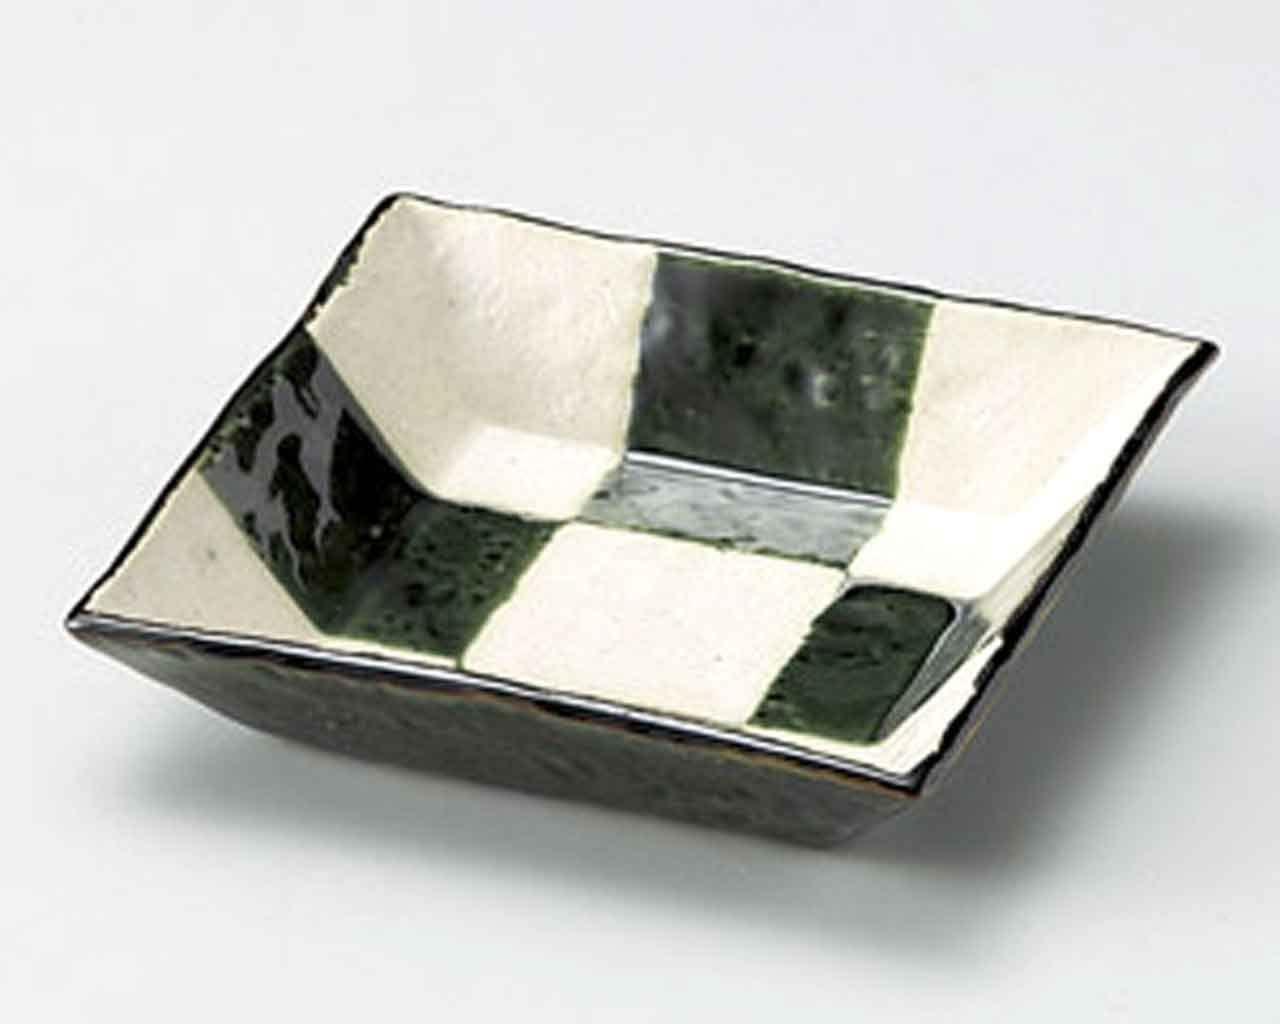 Oribe Kohshi 6.1inch Set of 2 Medium Plates White porcelain Made in Japan